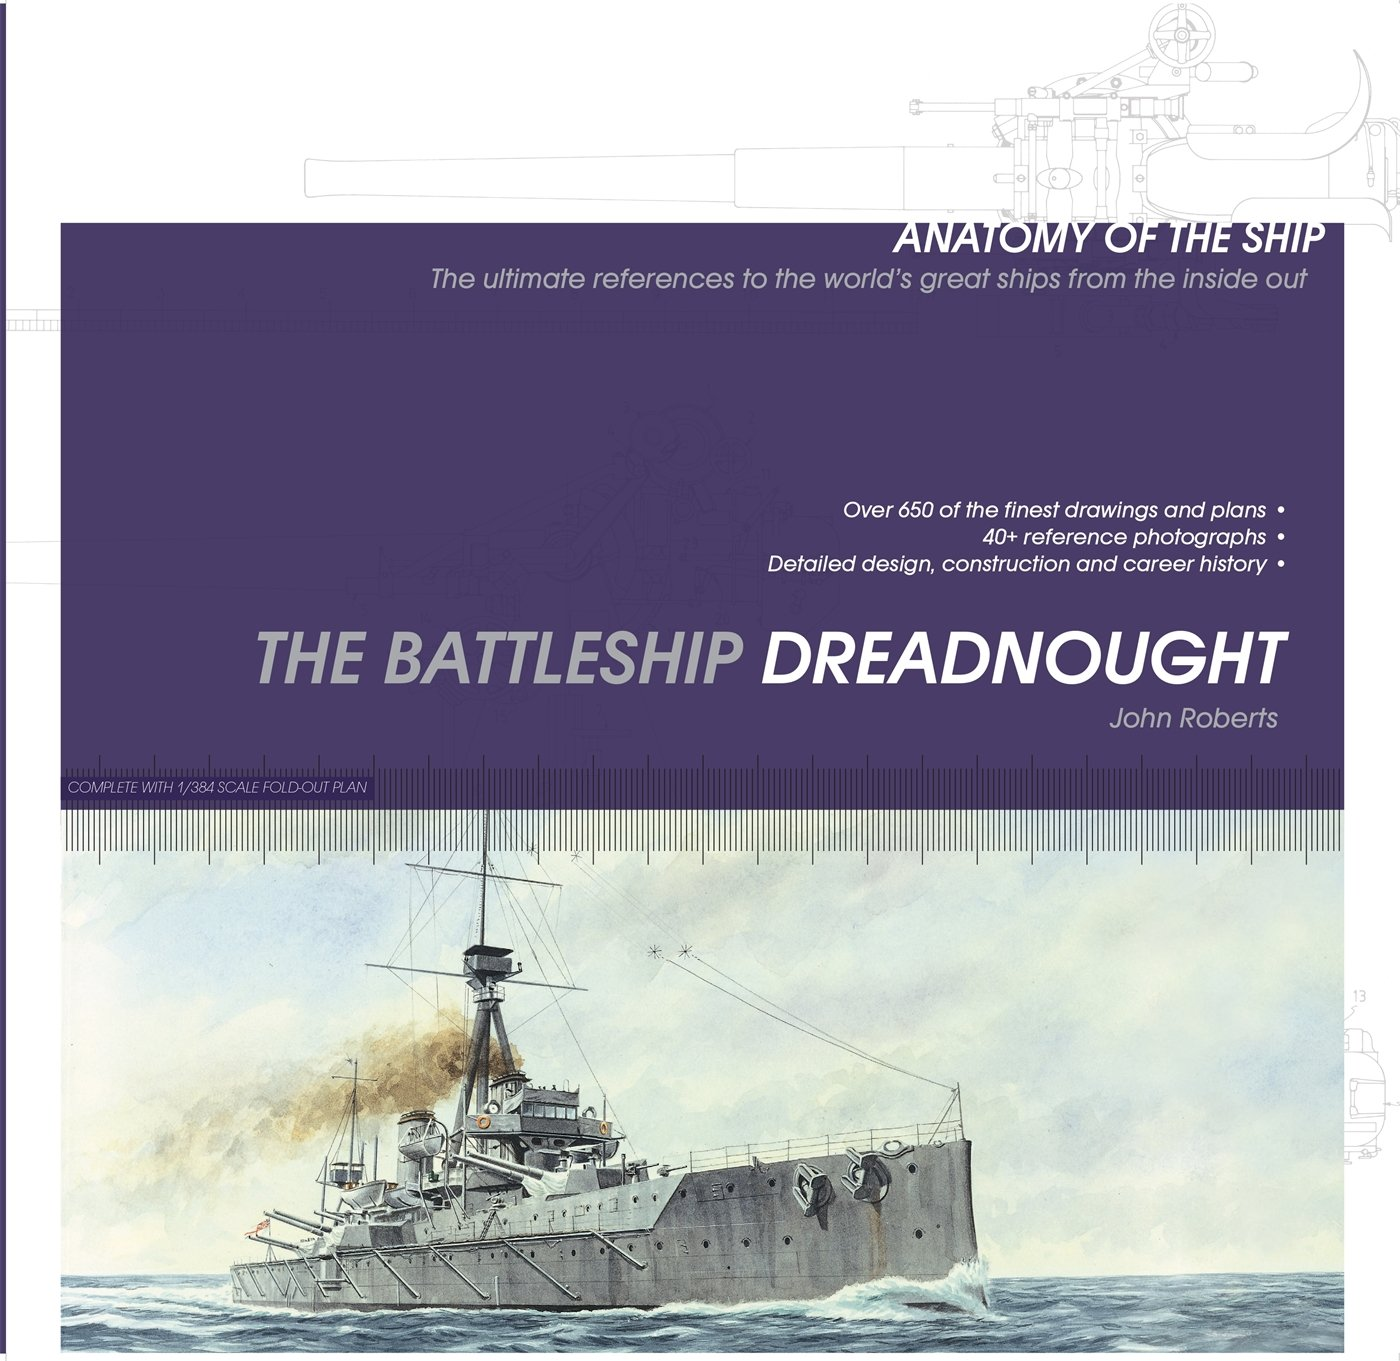 The Battleship Dreadnought (Anatomy of the Ship): John Roberts ...